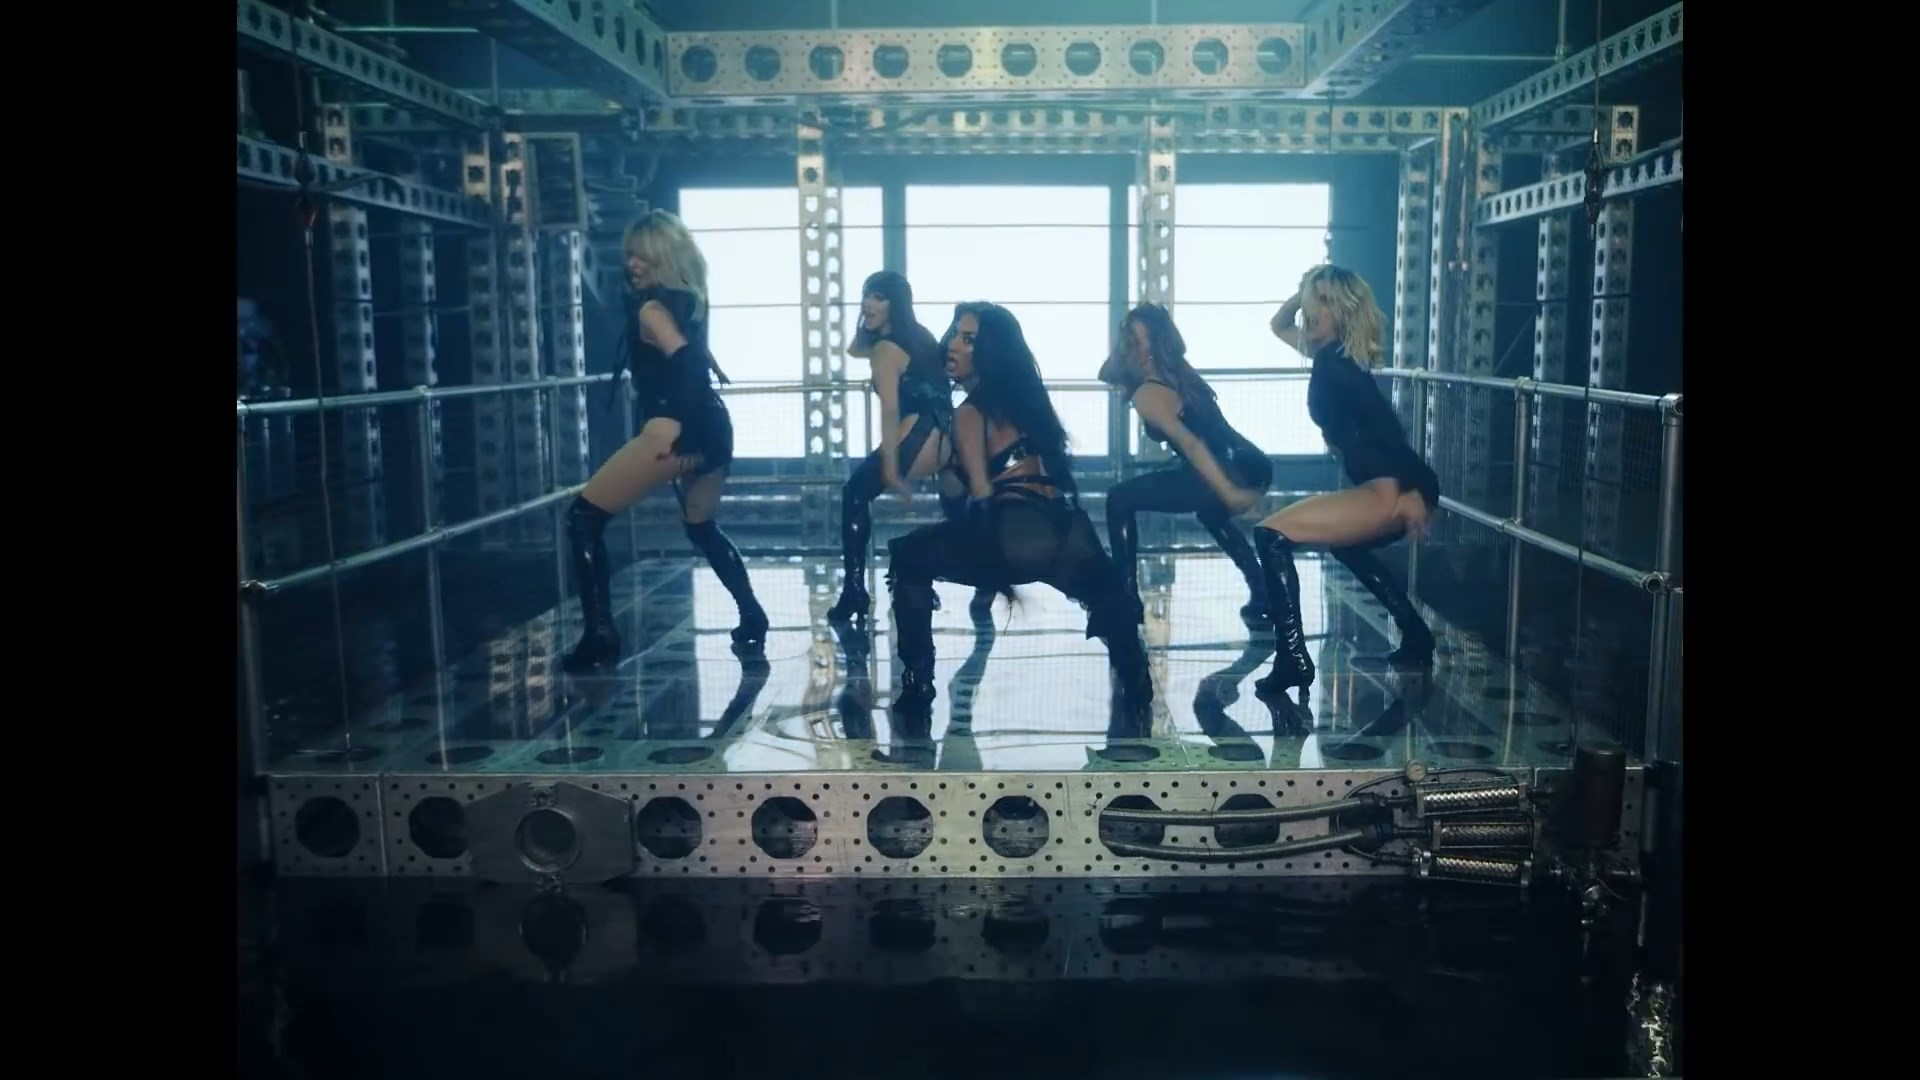 The Pussycat Dolls - React.mp4_snapshot_01.00_[2020.02.10_03.38.14].jpg